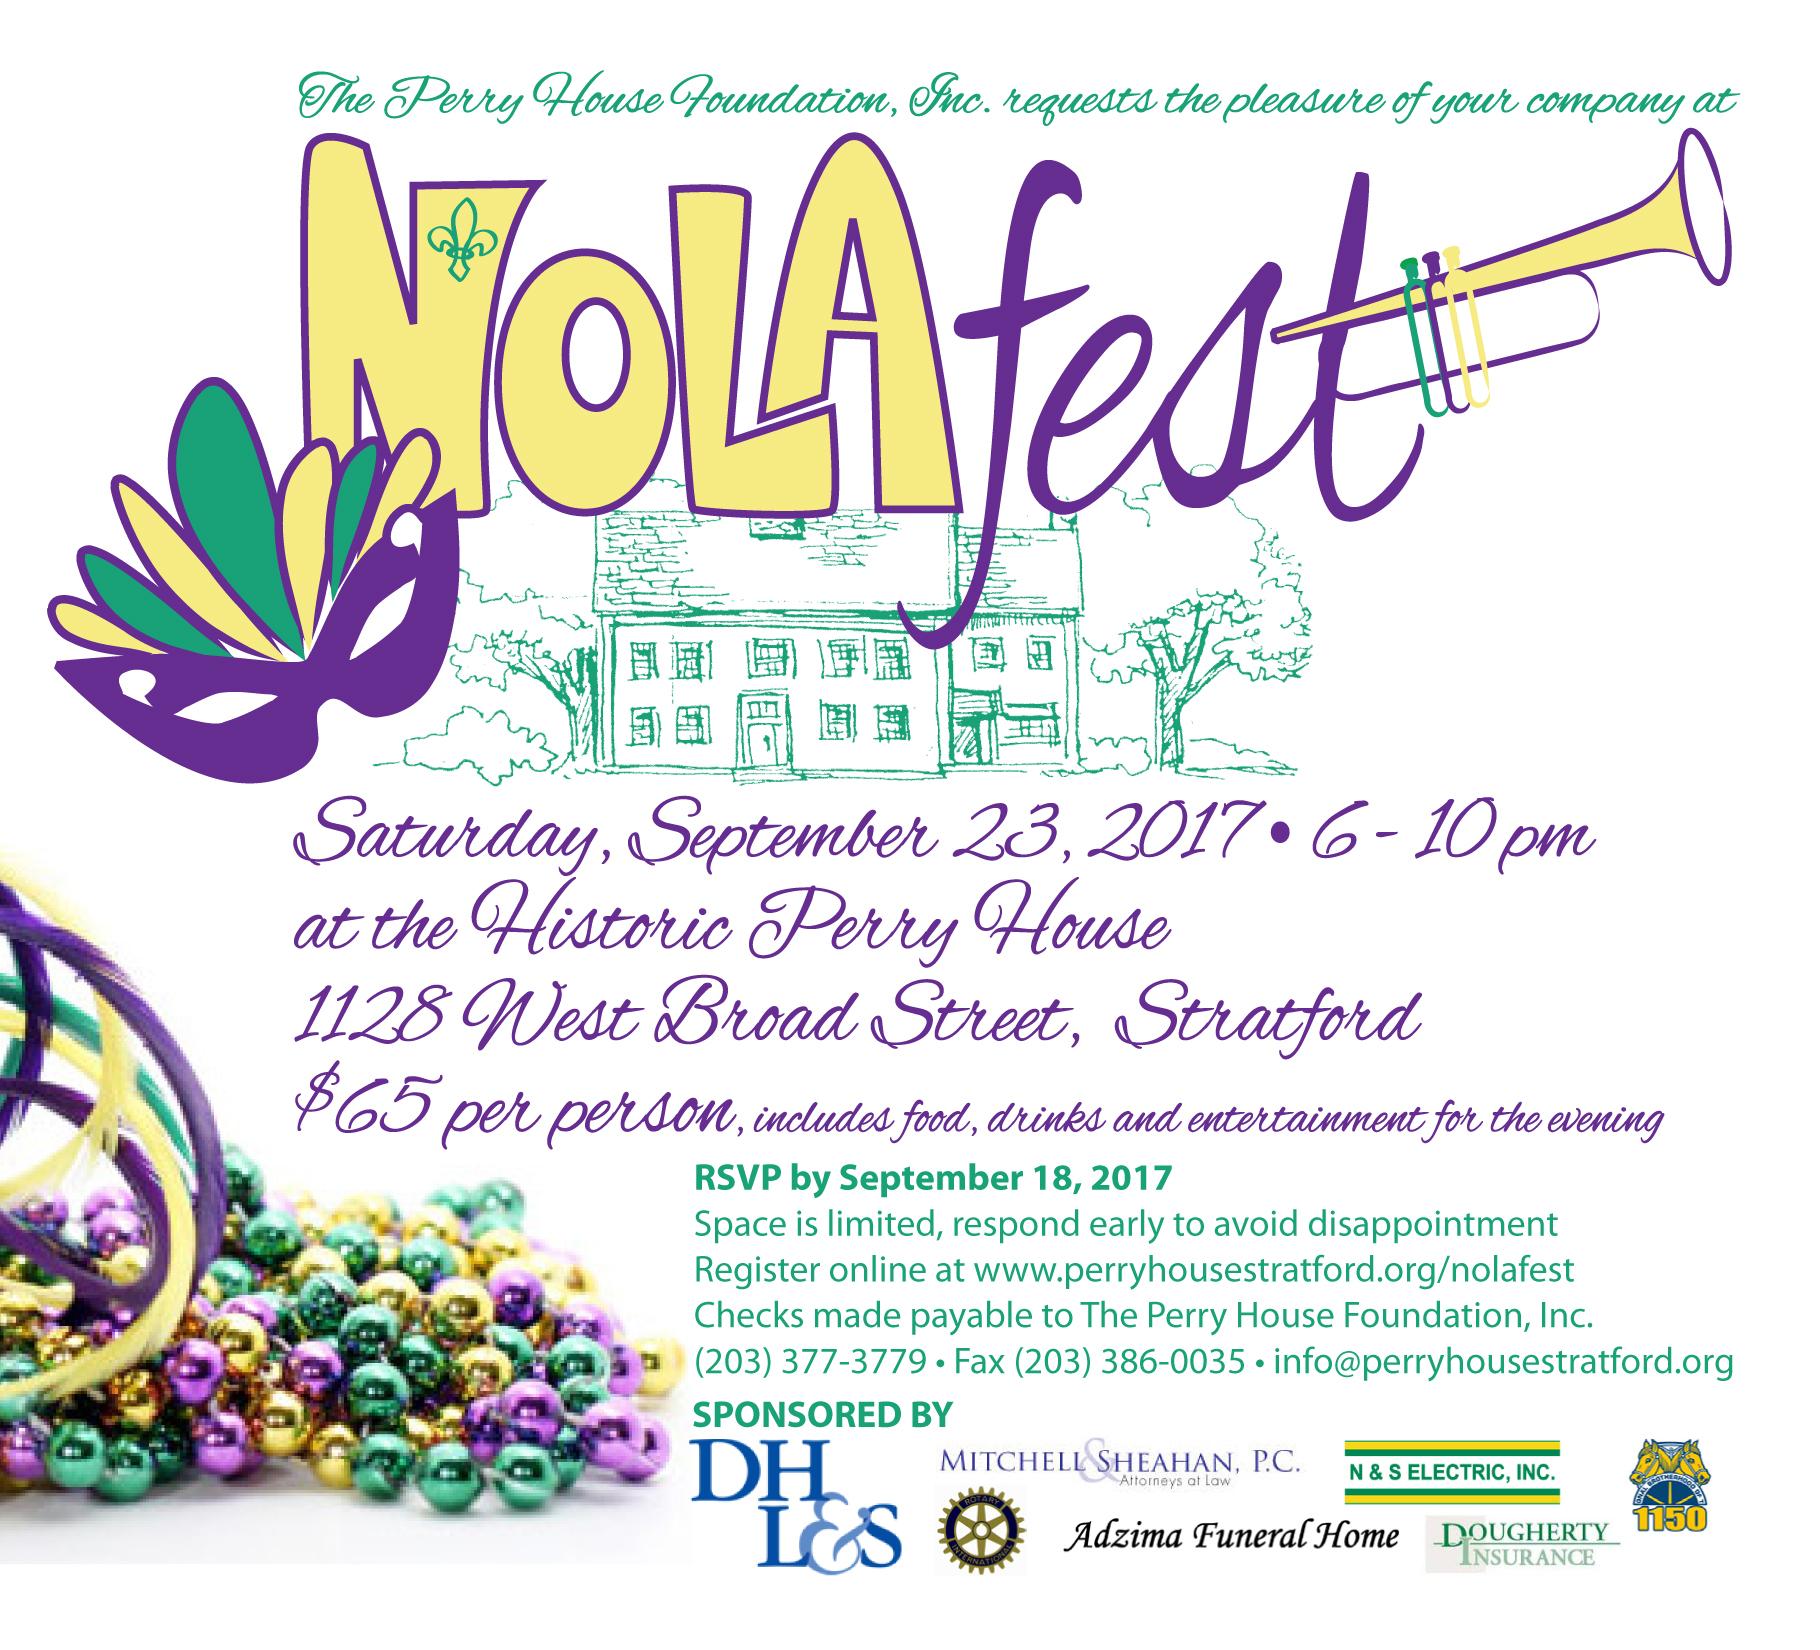 NOLAfest invite 2017-1.jpg